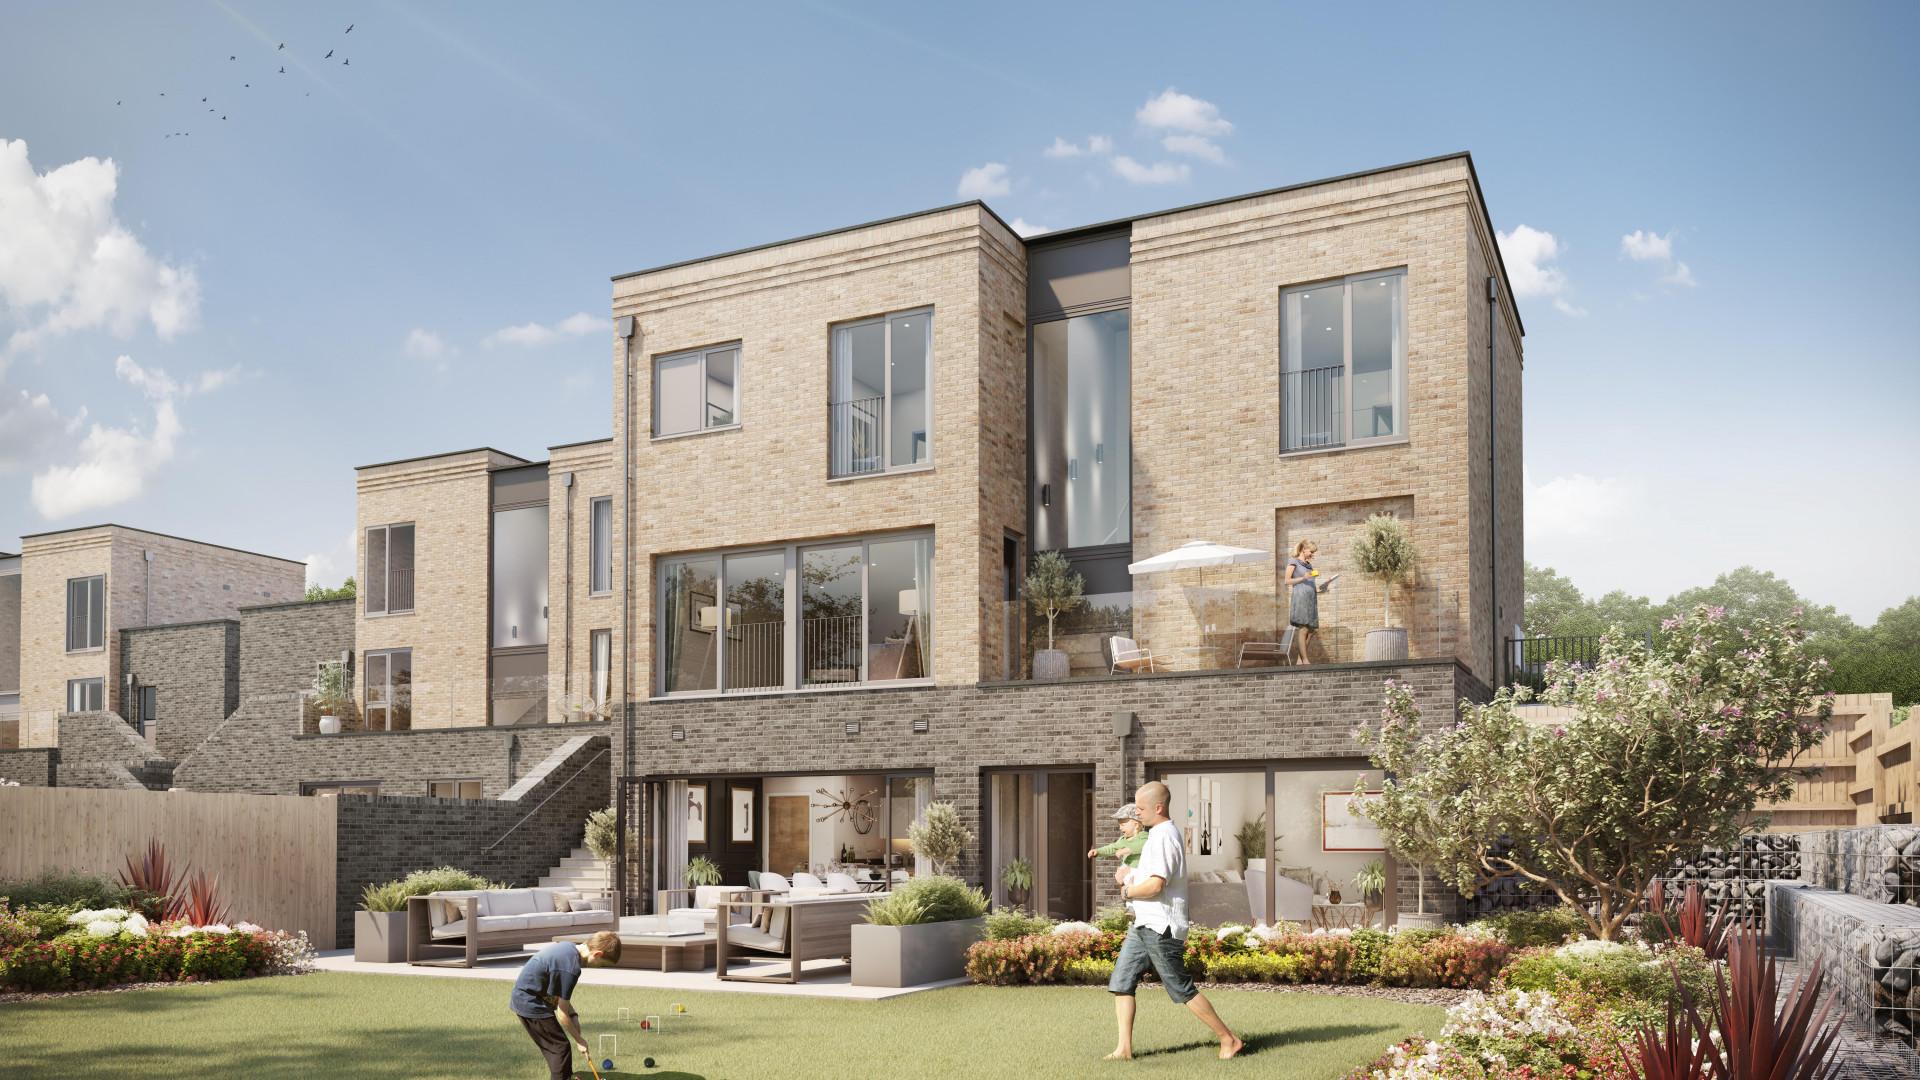 Ridgeway Views North West London Development Outdoors GCI